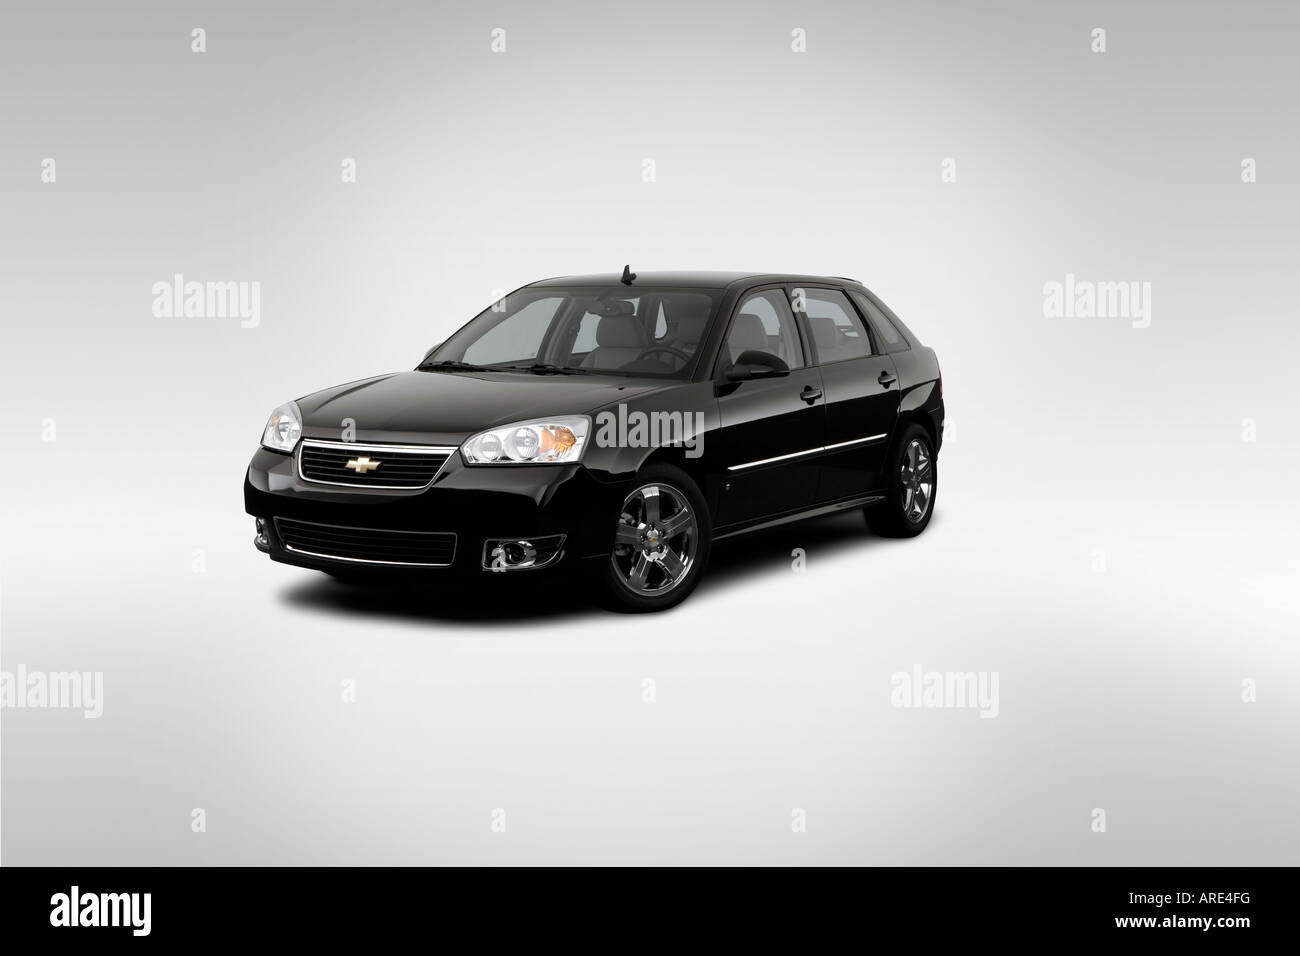 2005 Chevrolet Malibu Maxx LT In Black   Front Angle View